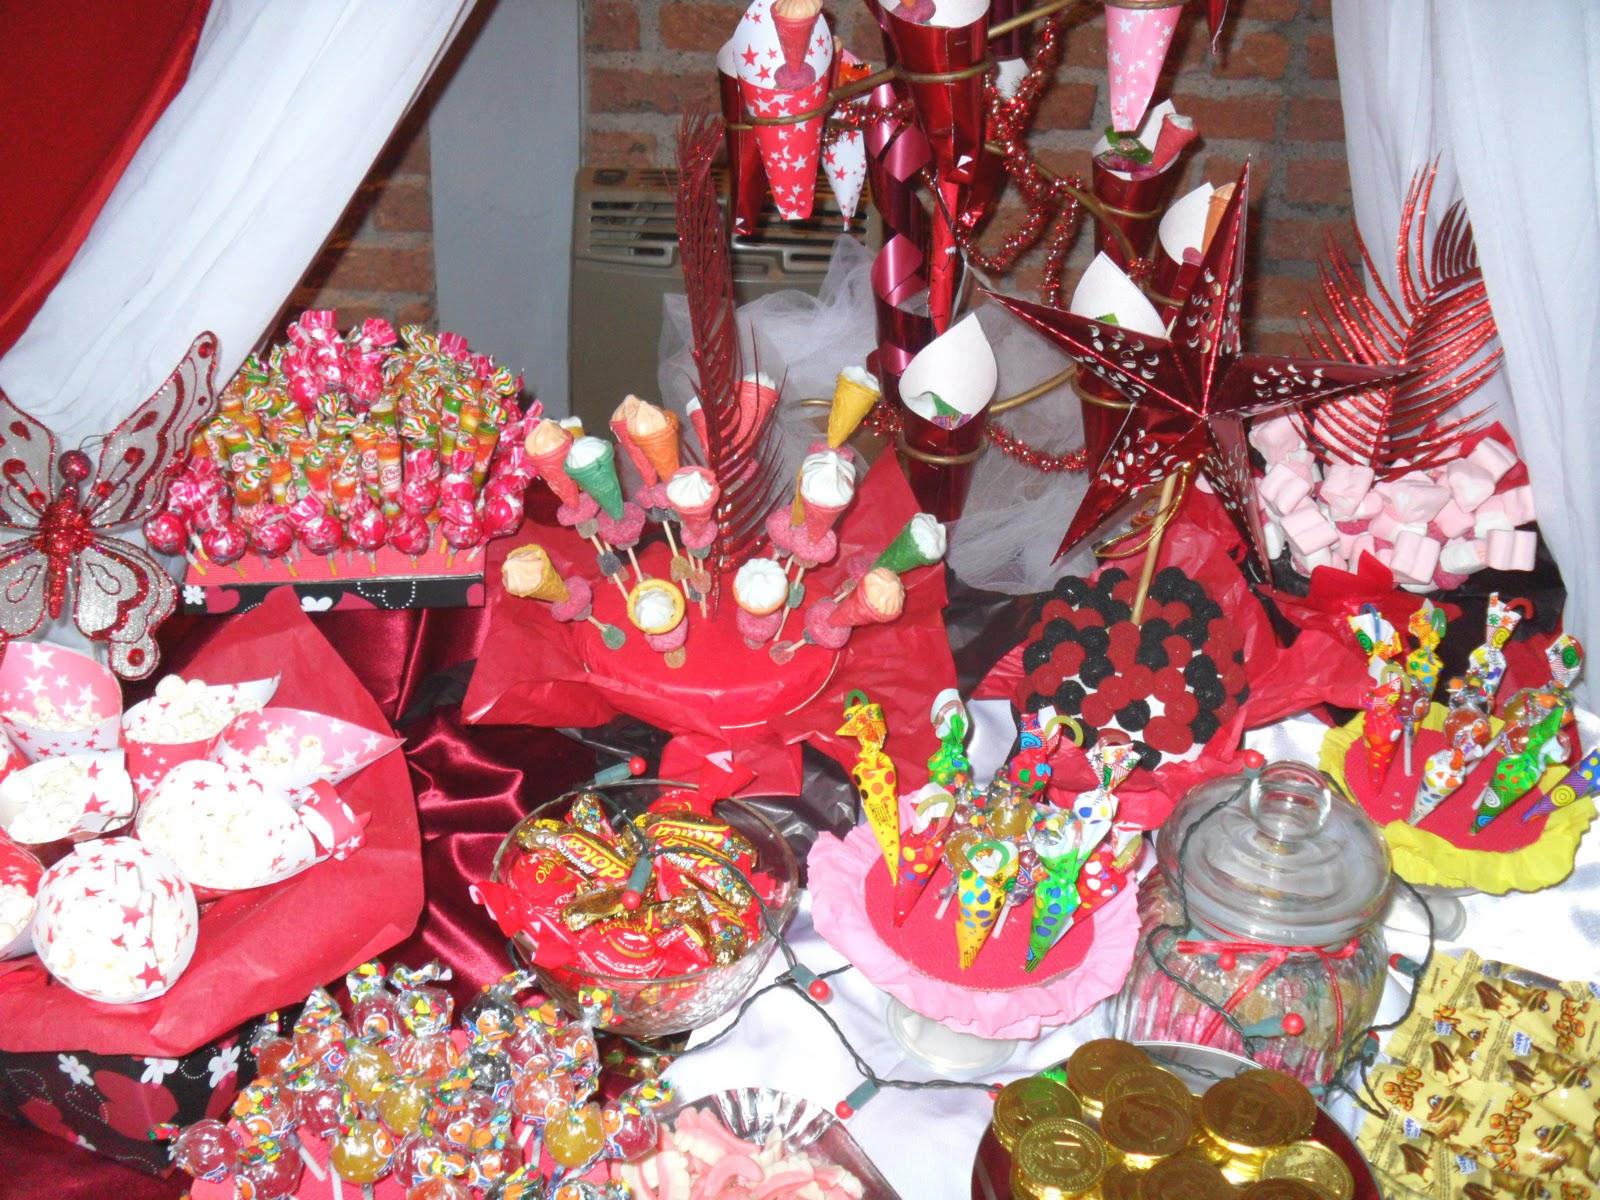 Mario olguin ambientaciones mendoza mesa dulce 15 a os for Mesa de dulces para xv anos